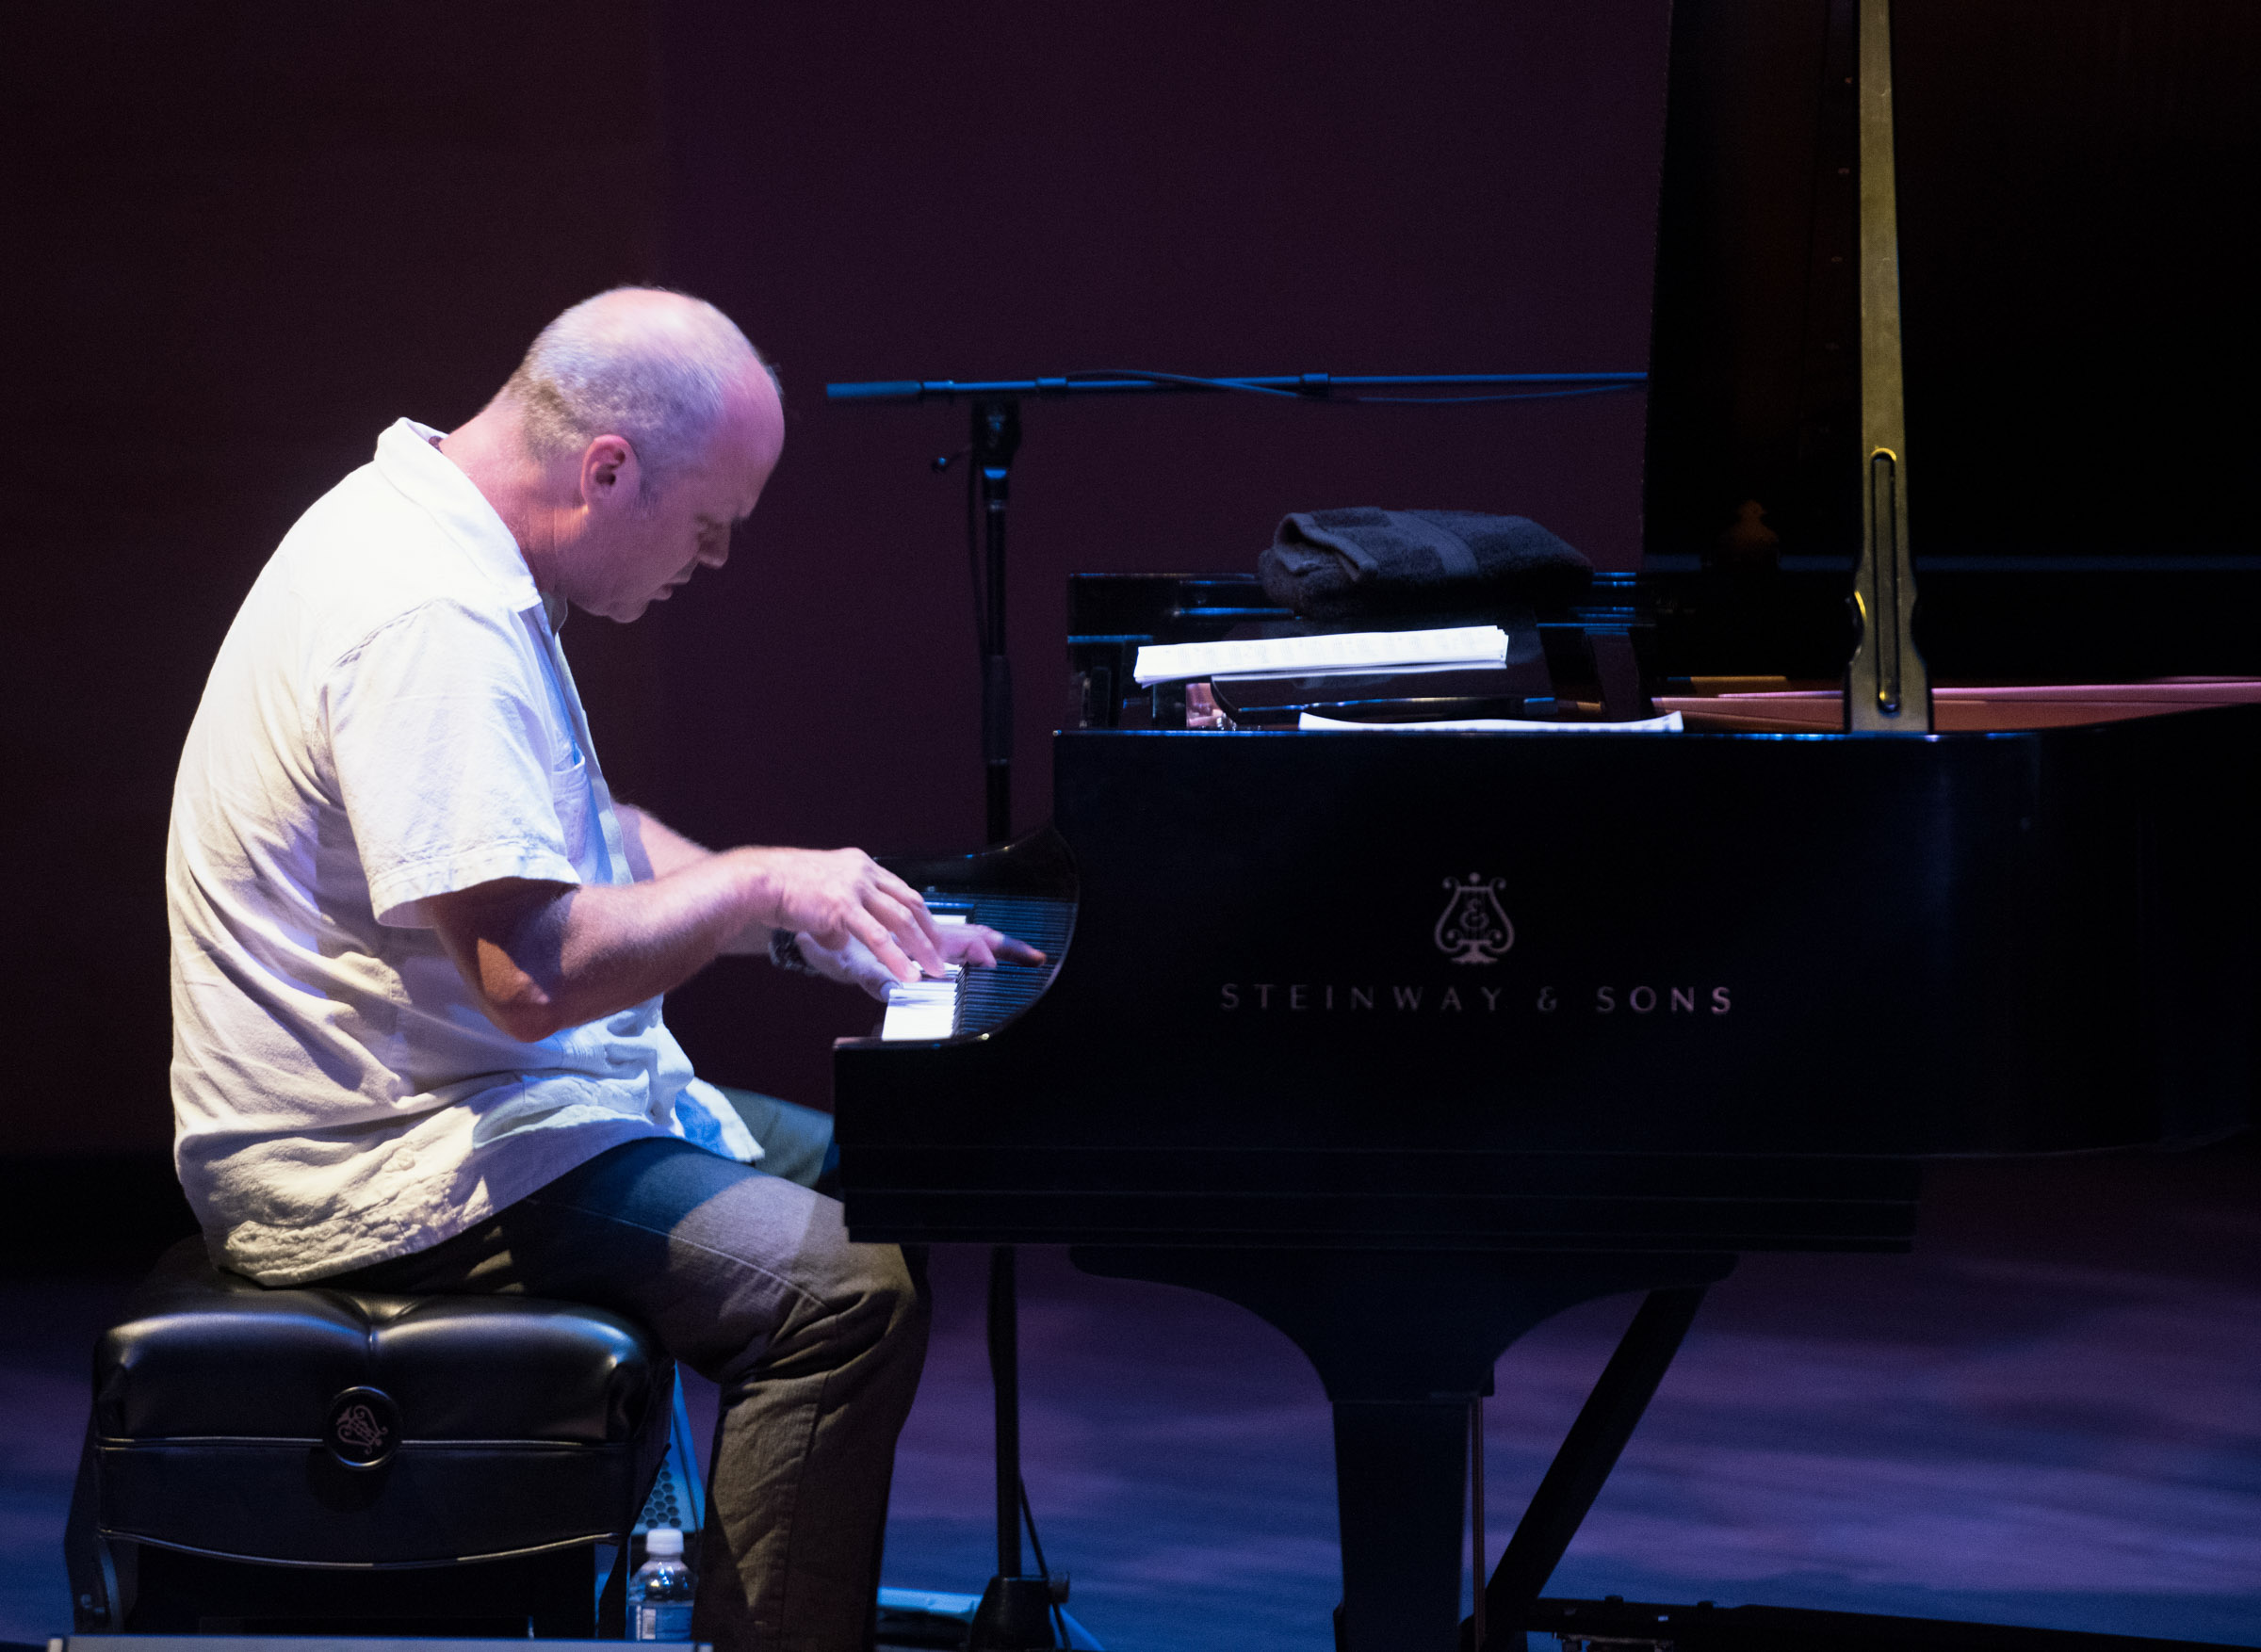 John Medeski With Medeski Scofield Quartet At The Musical Instruments Museum (mim) In Phoenix